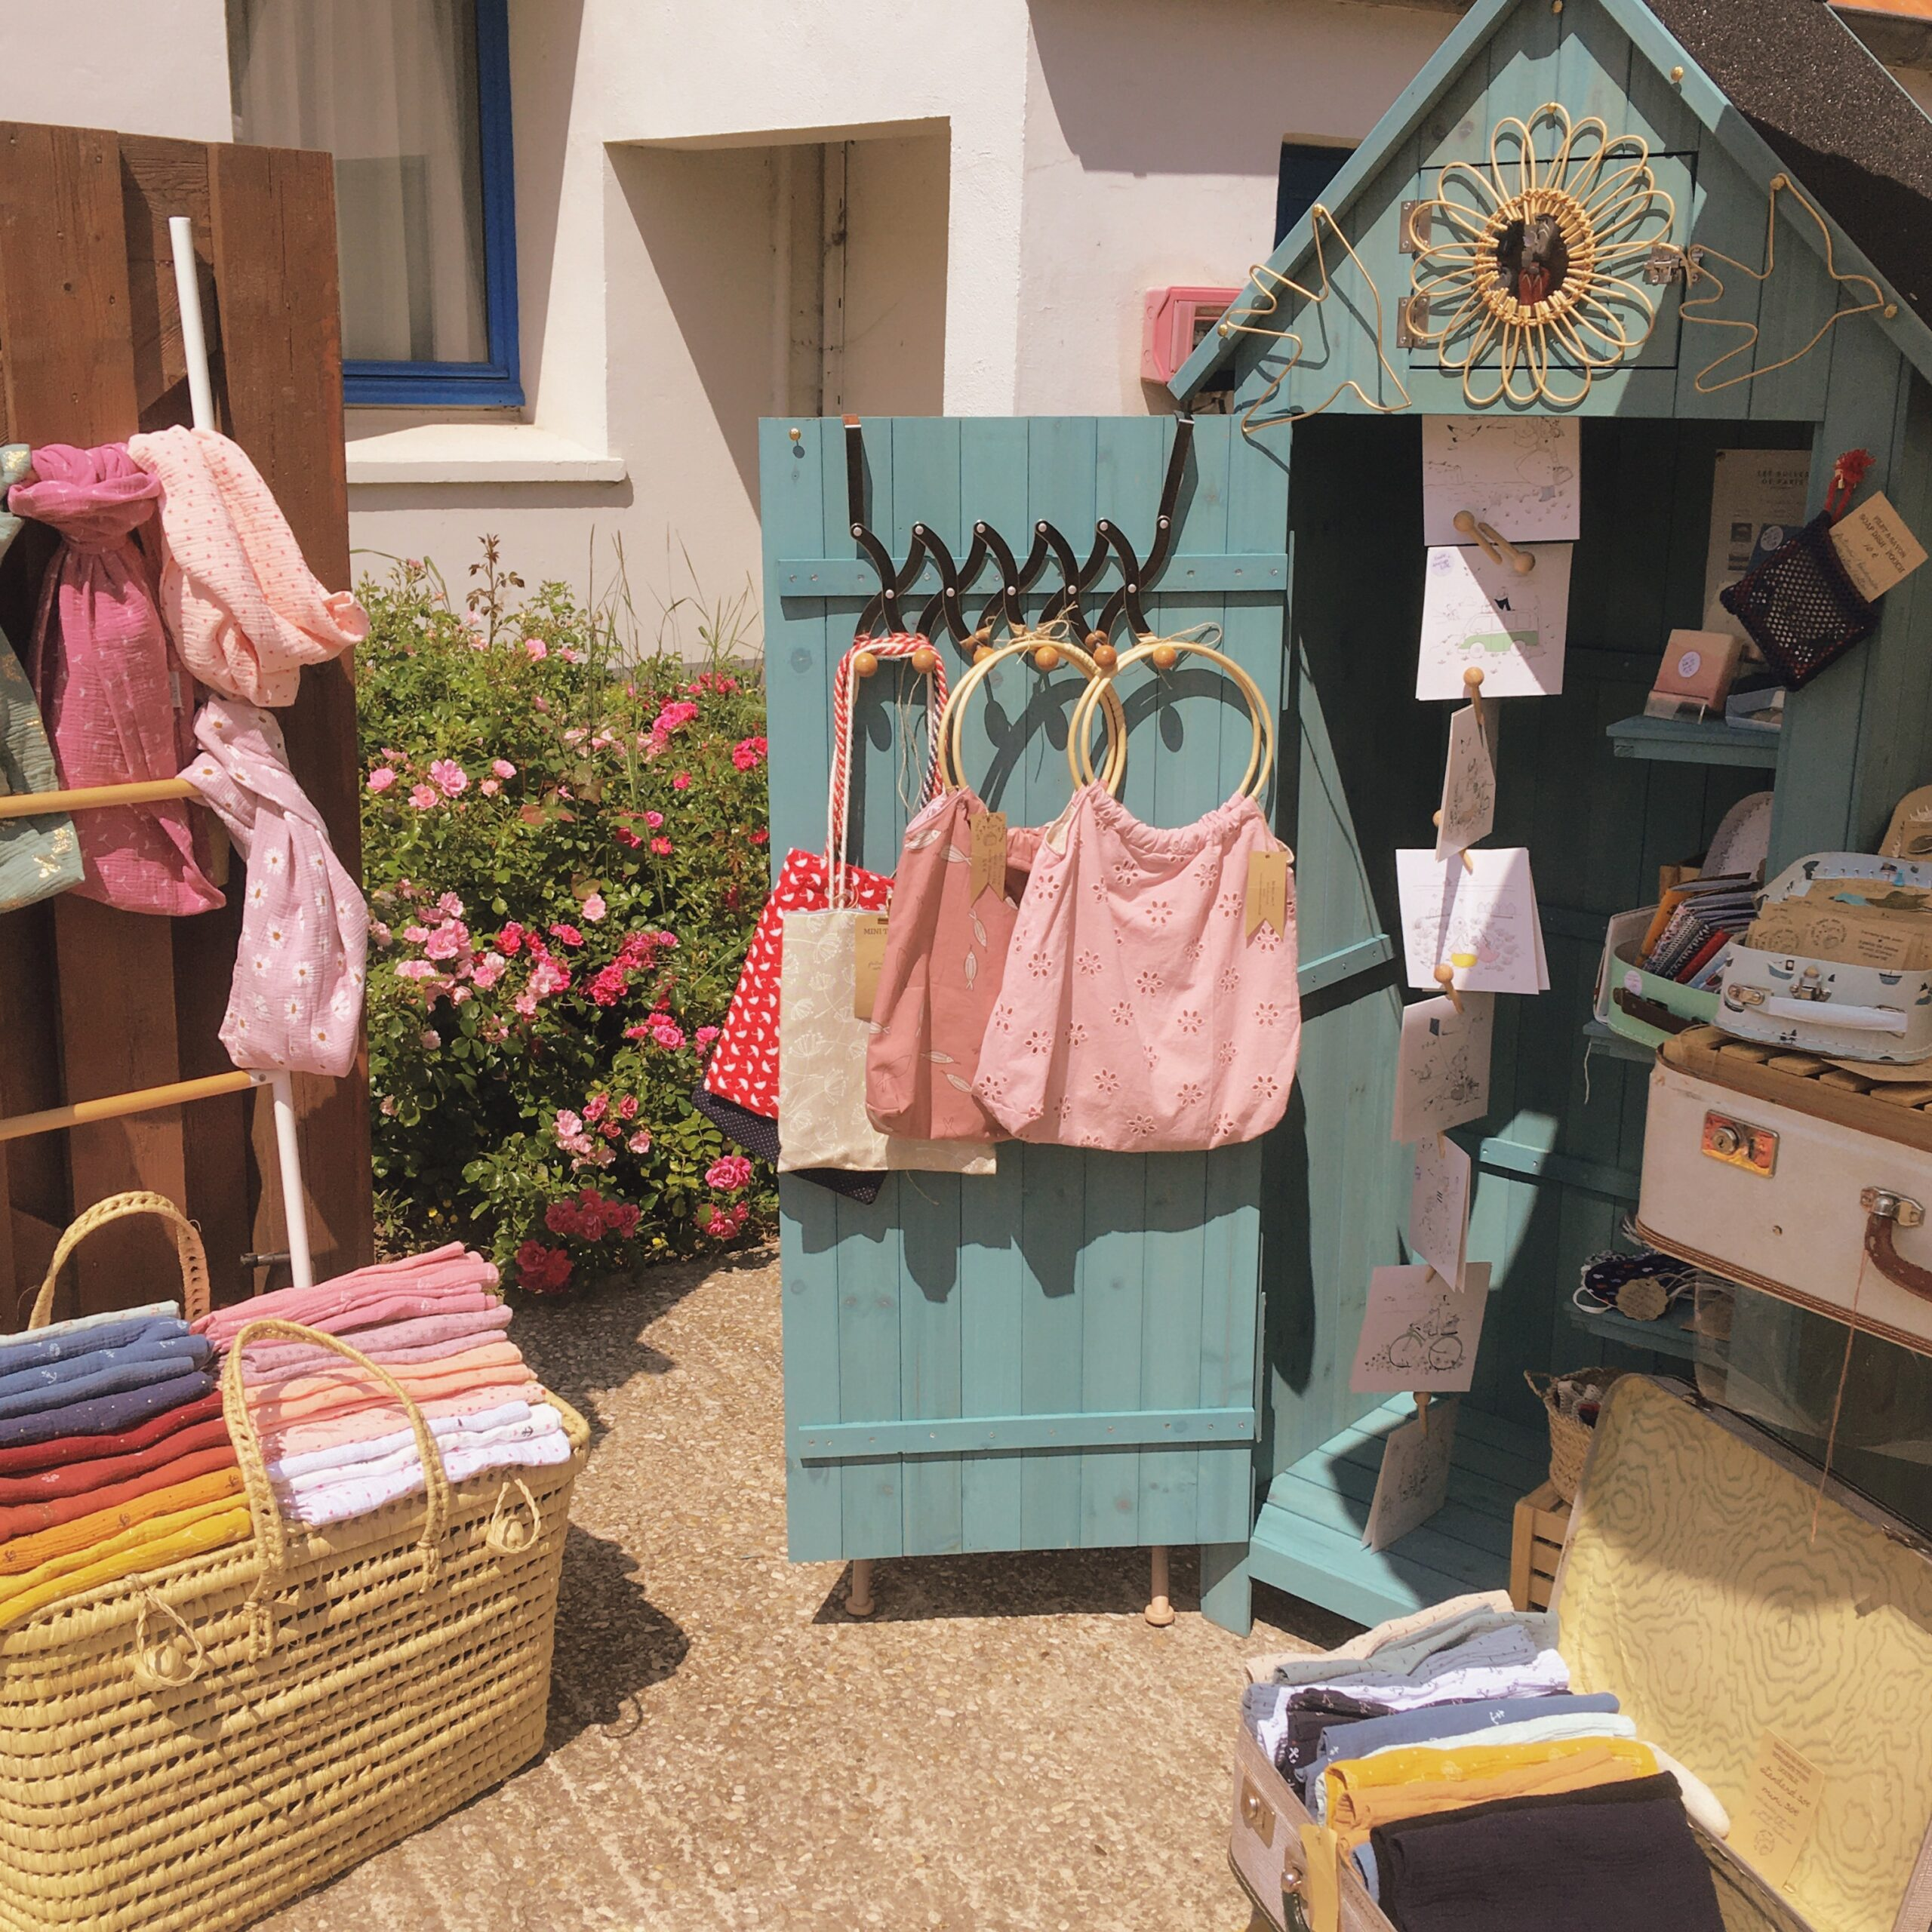 accessoires-made-in-France-confection-artisanale-by-du-vent-dans-mes-valises